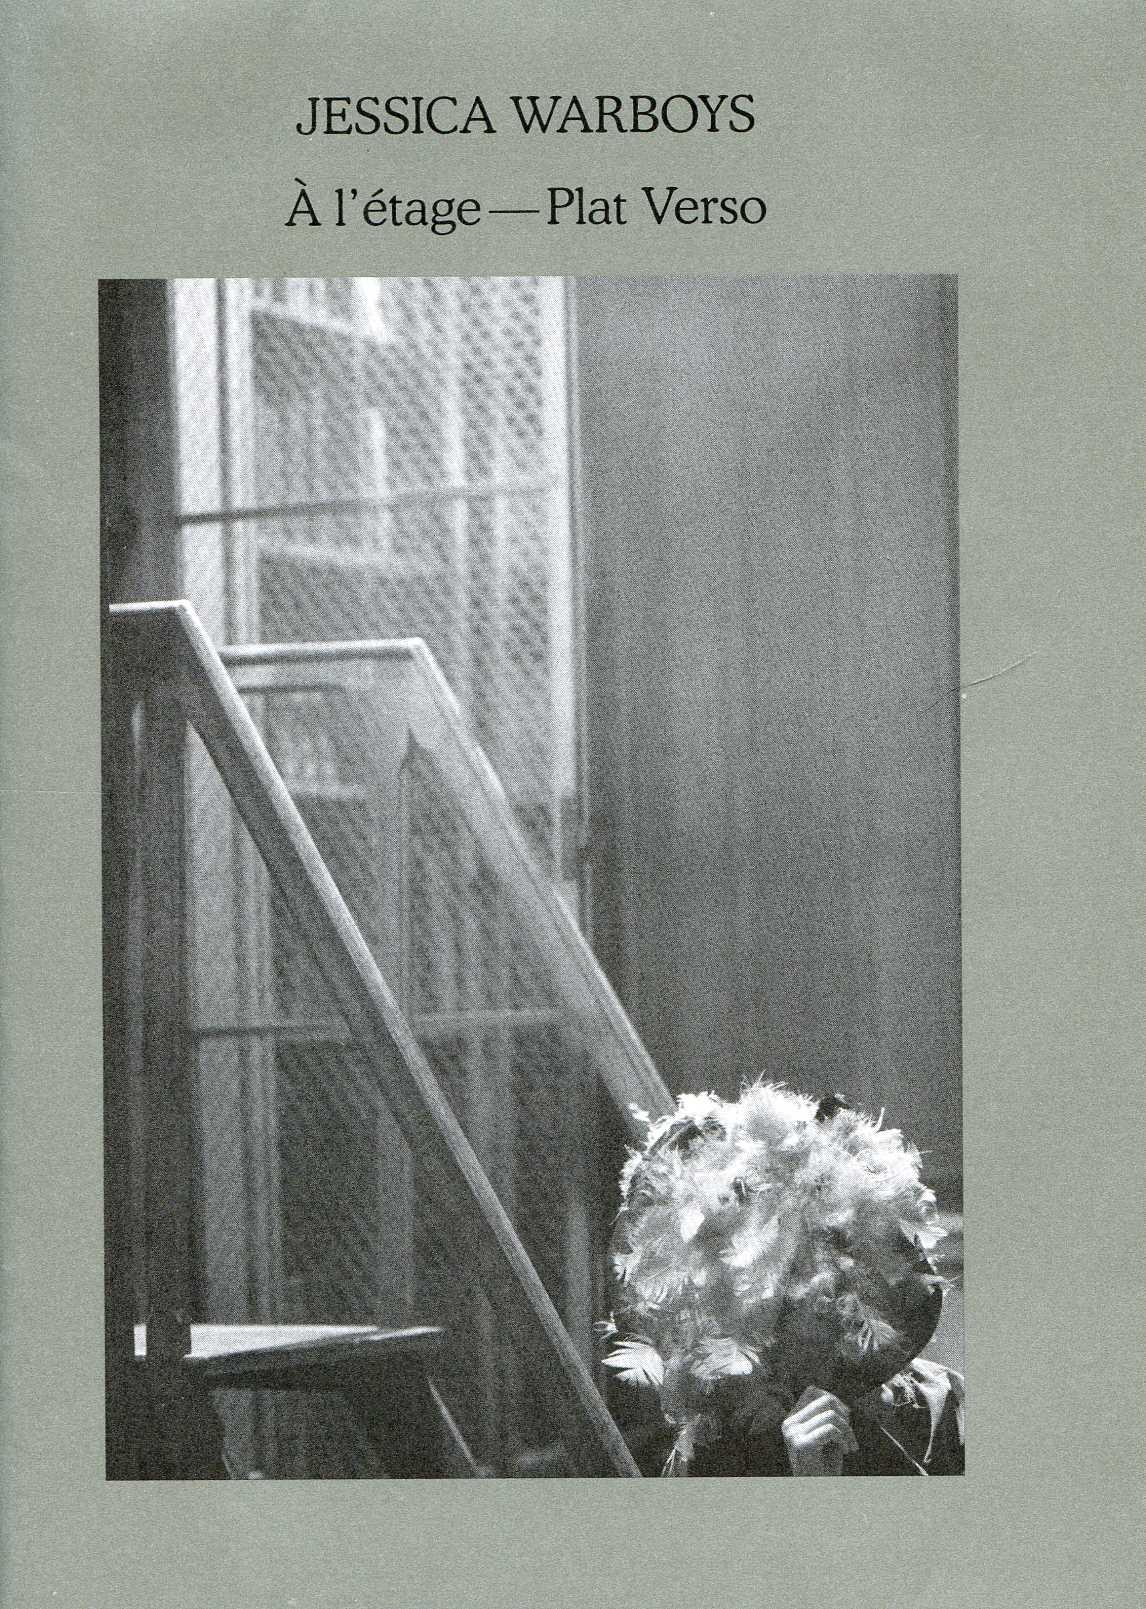 JESSICA WARBOYS, A L'ETAGE - PLAT VERSO